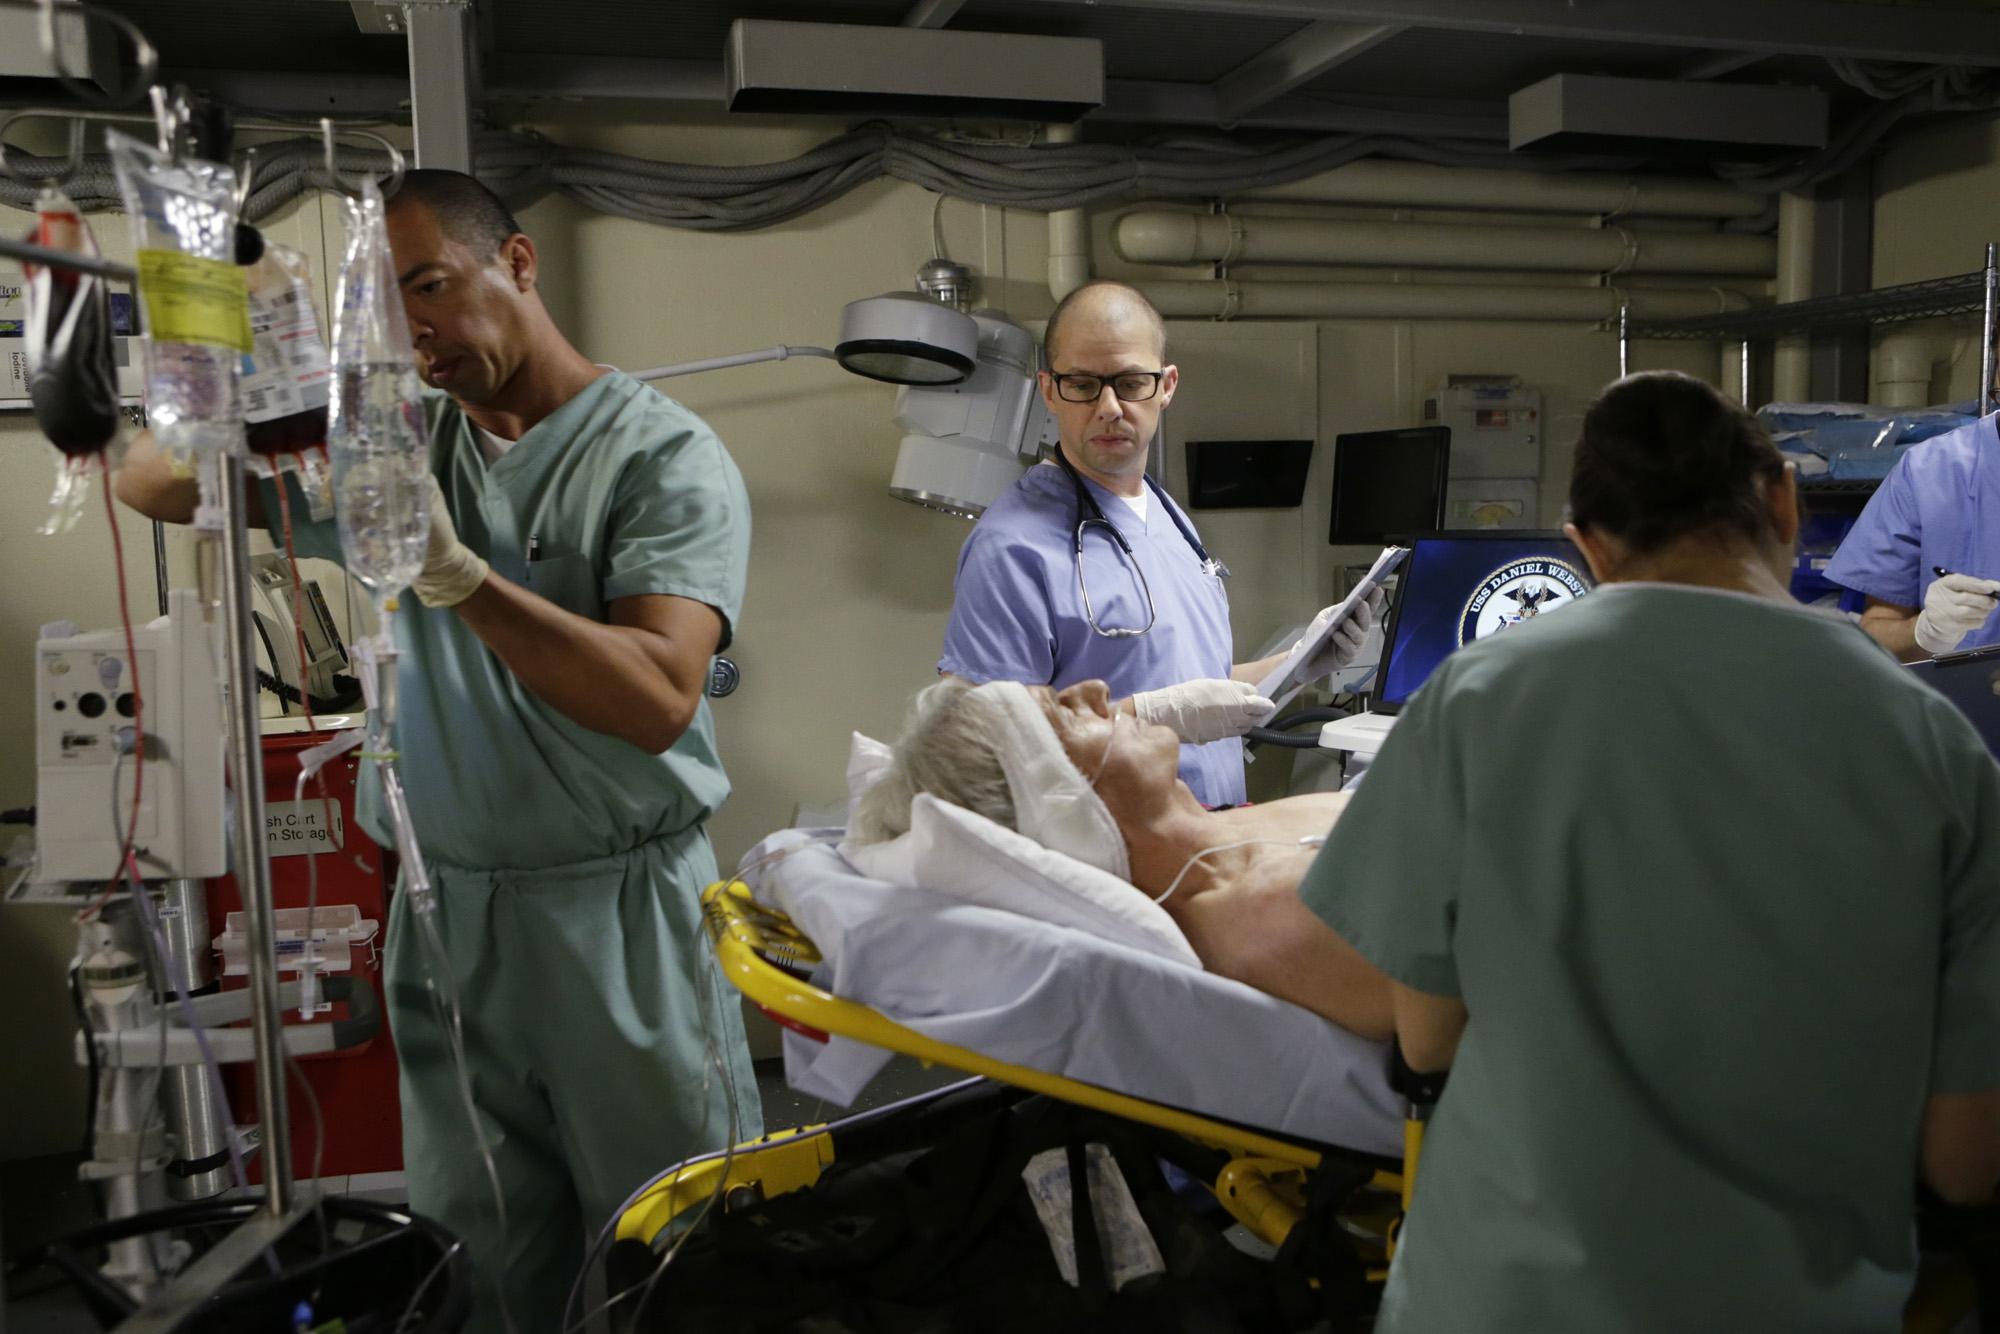 Jon Cryer as Gibbs' surgeon, Dr. Cyril Taft.